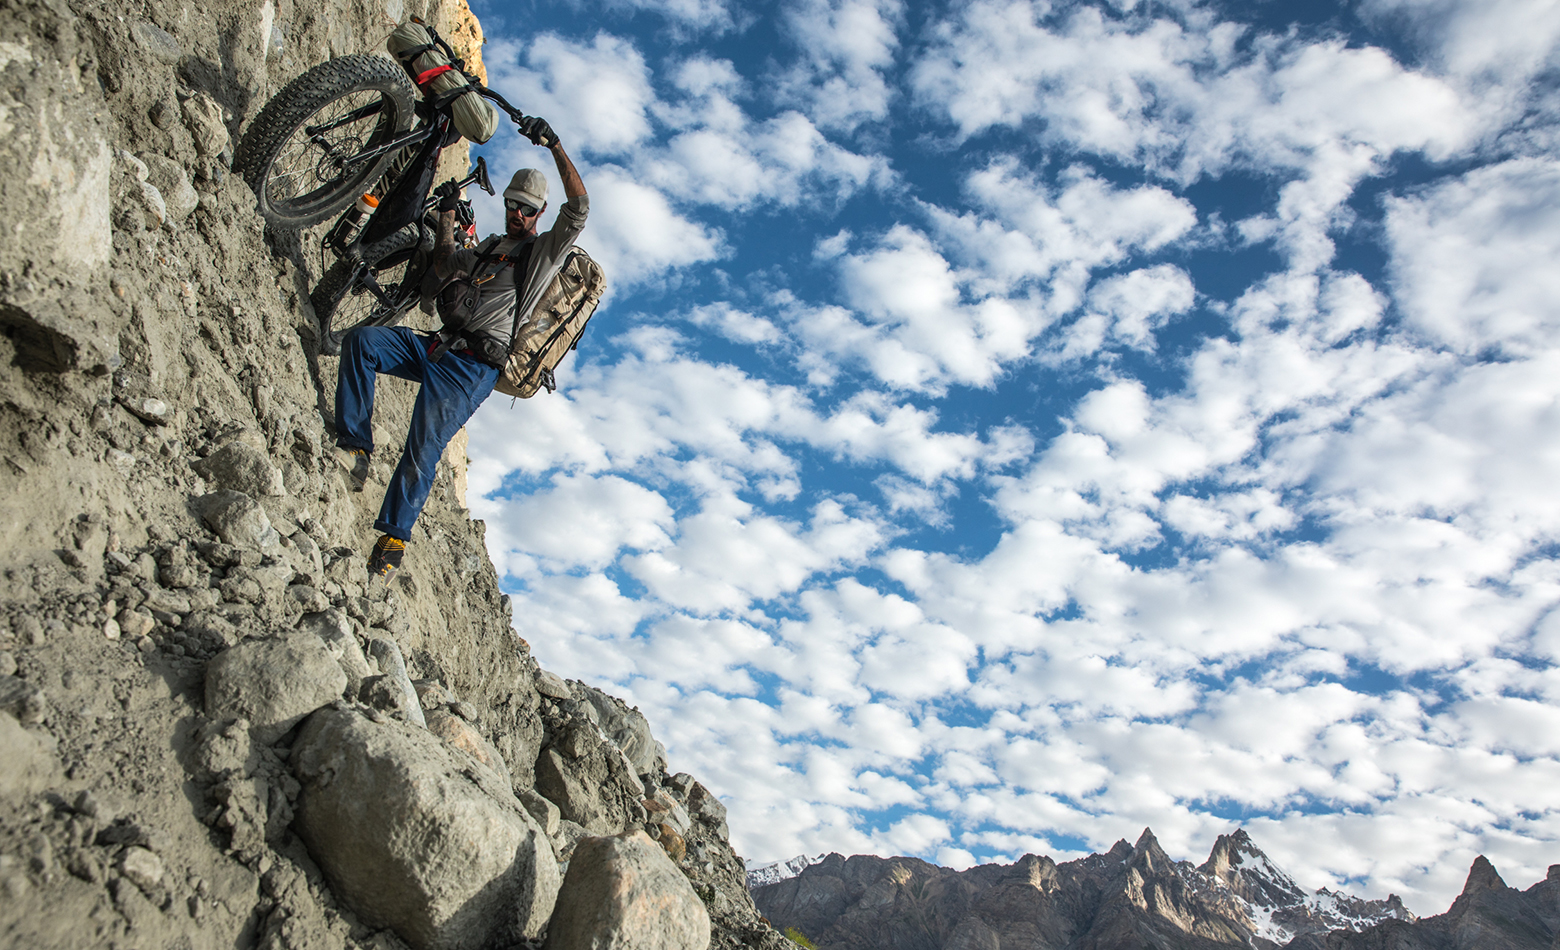 Steve Fassbinder, Biafo Glacier, Latok Traverse, Karakoram Mountains, Pakistan